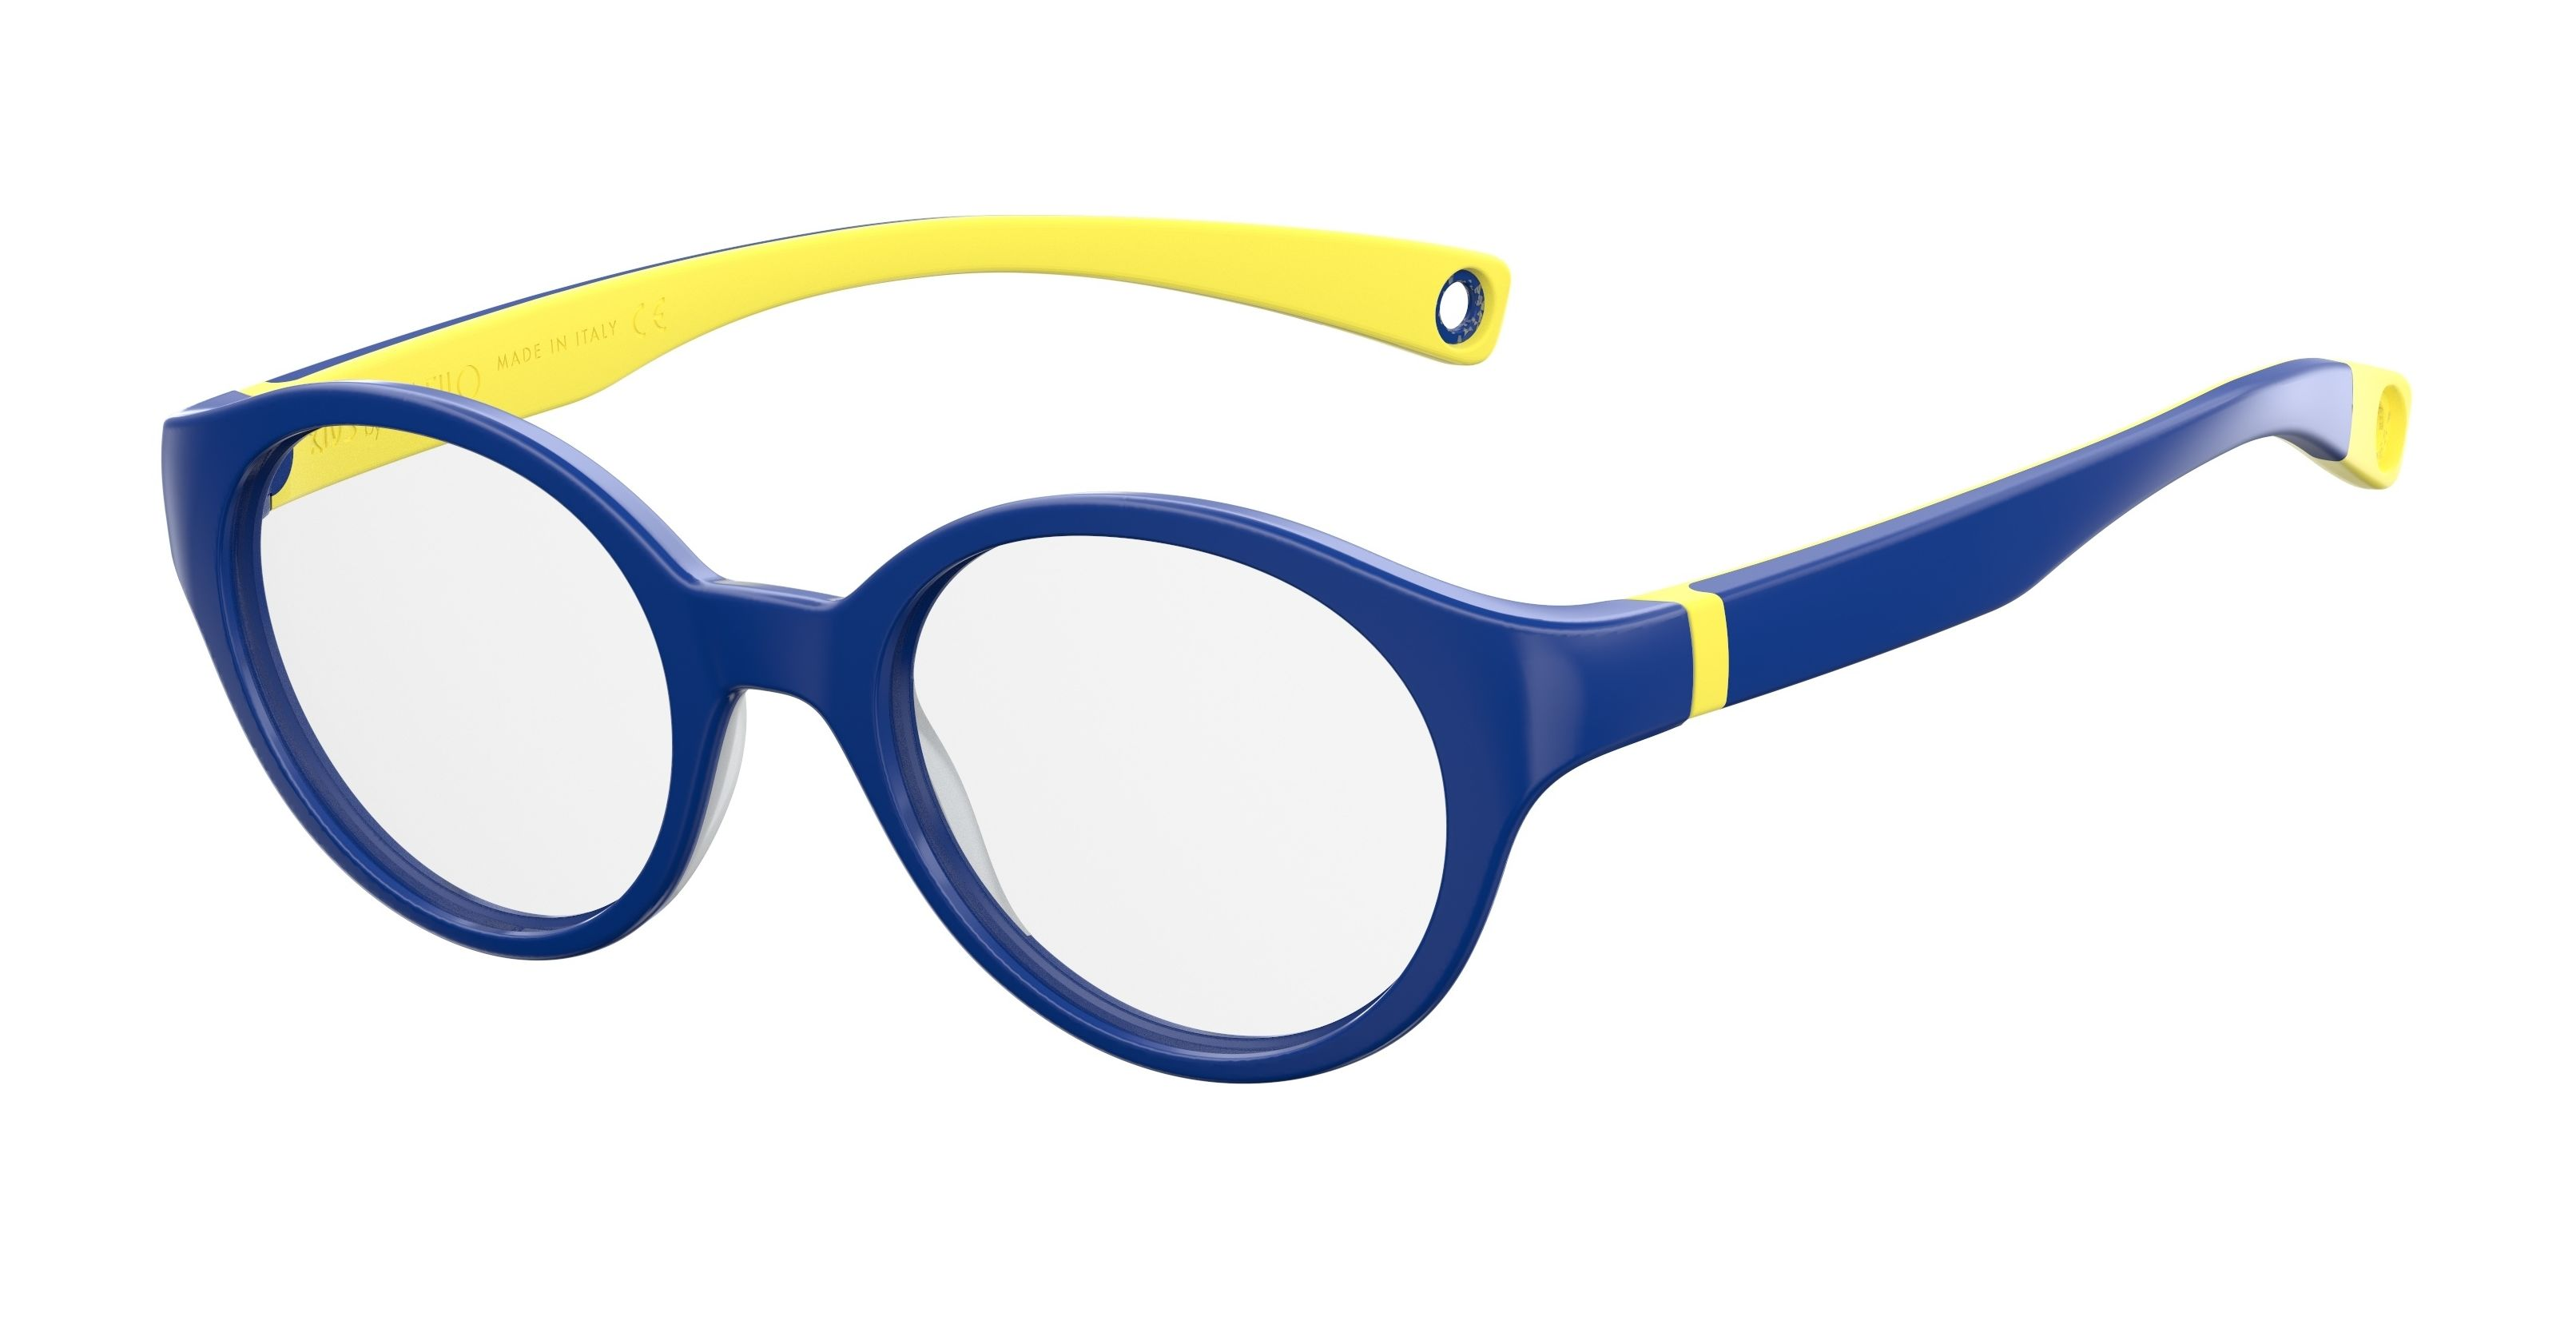 38a306da2819e Eyewear for Kids - Blue Kids By Safilo - Optiwow